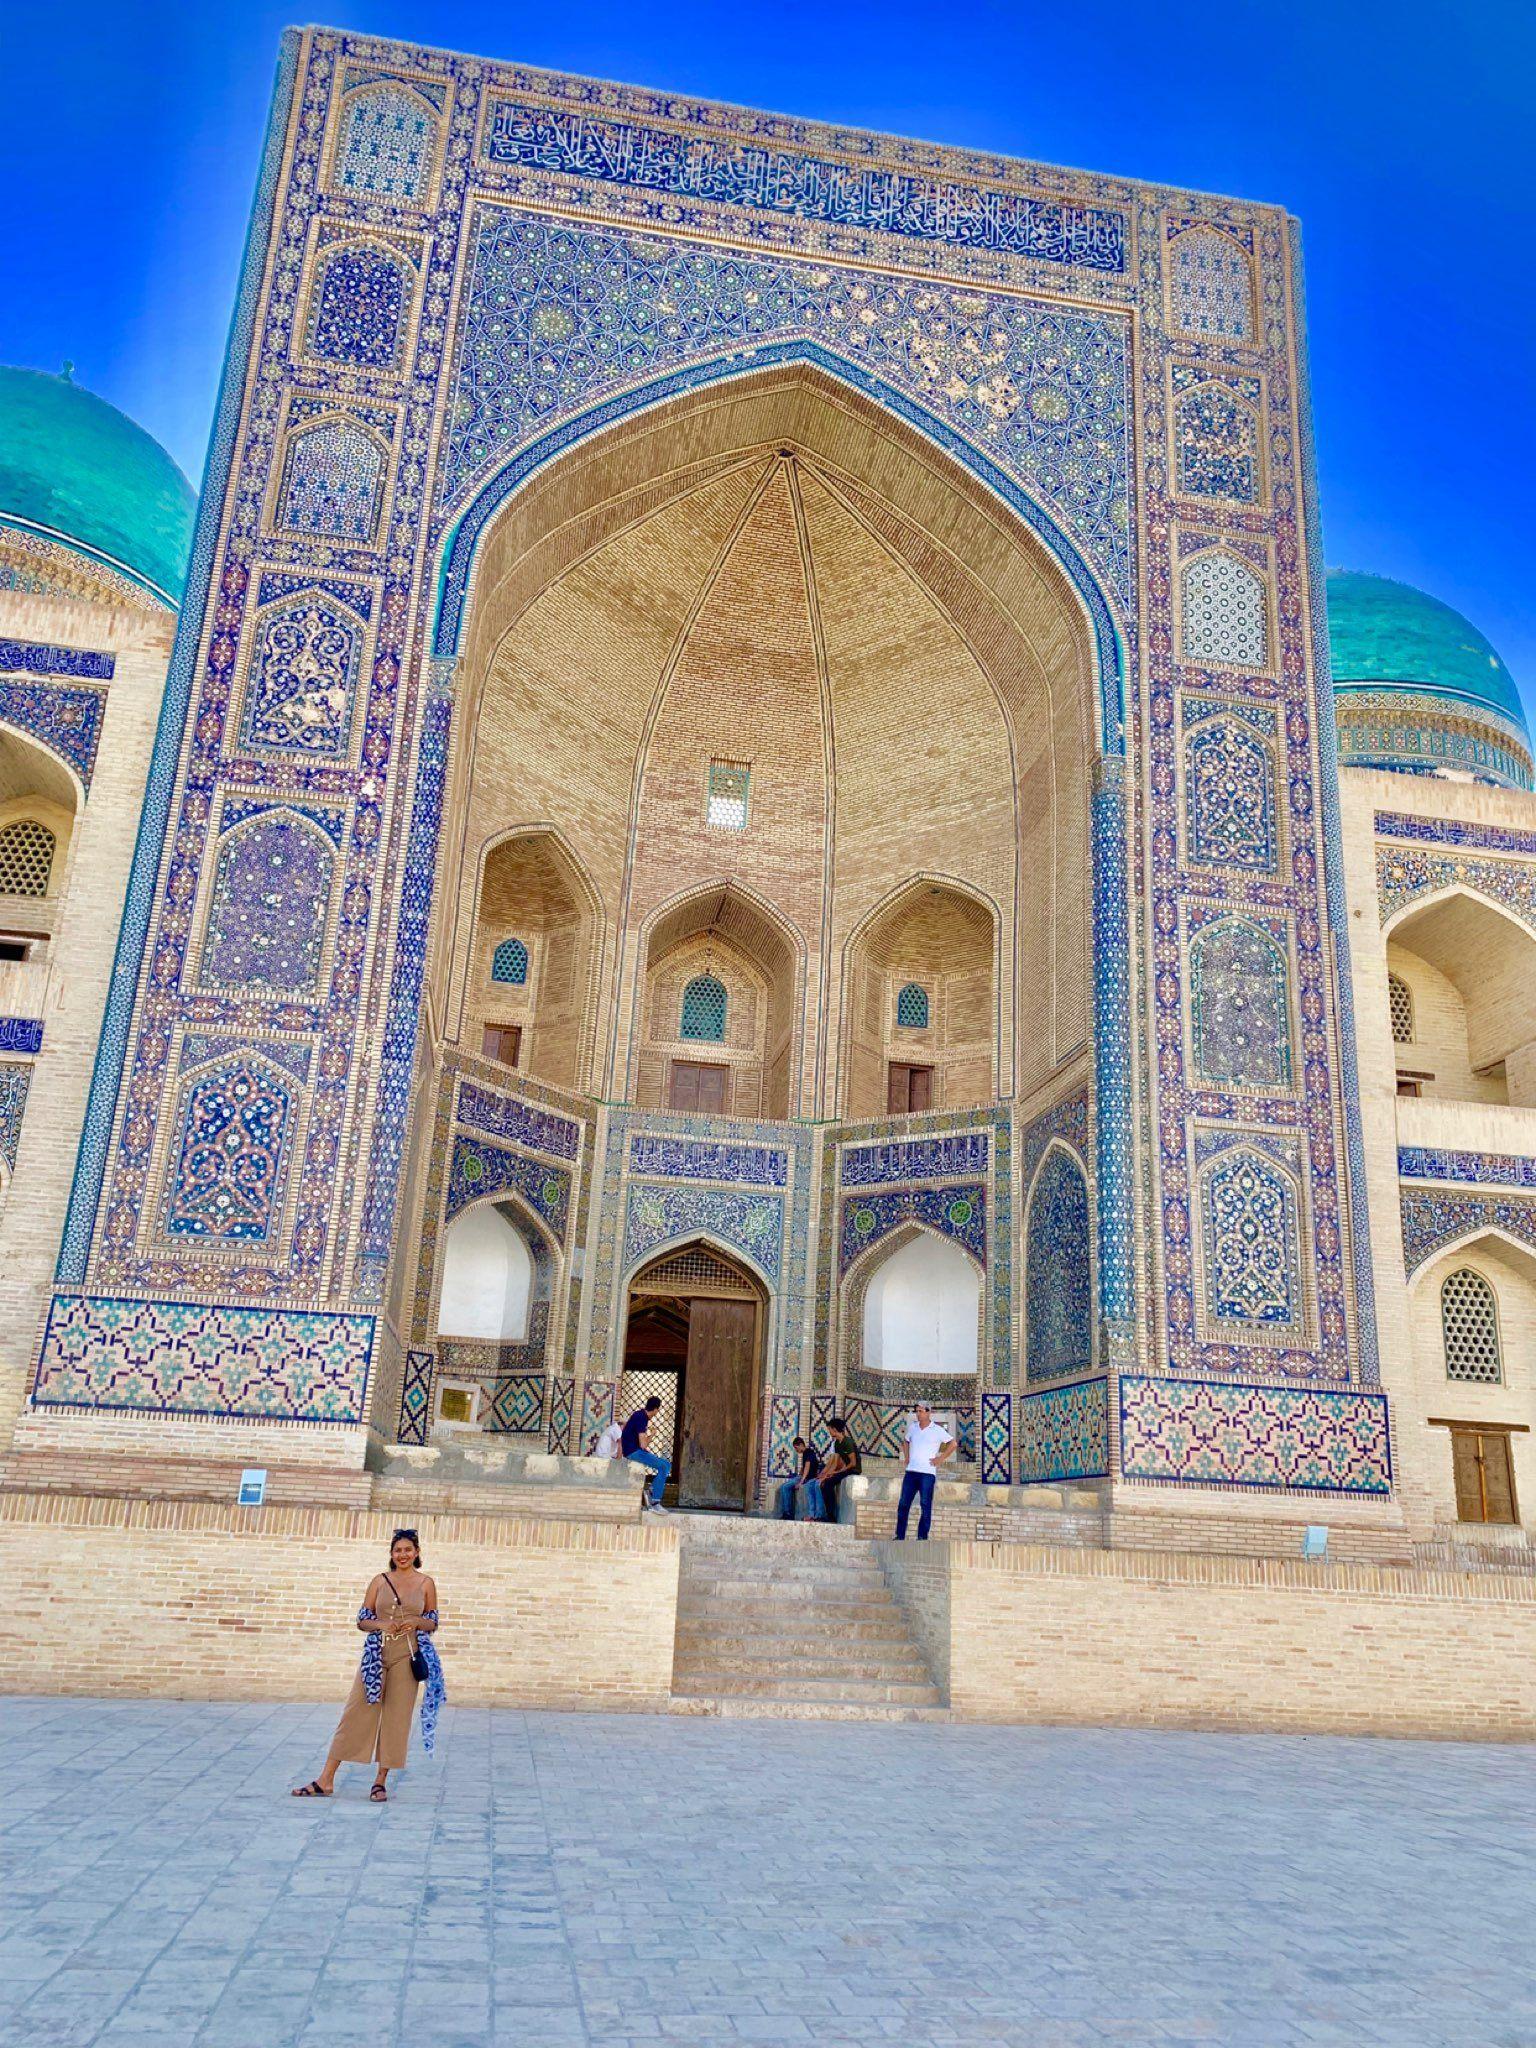 Train Ride and Overland Adventure in Uzbekistan1